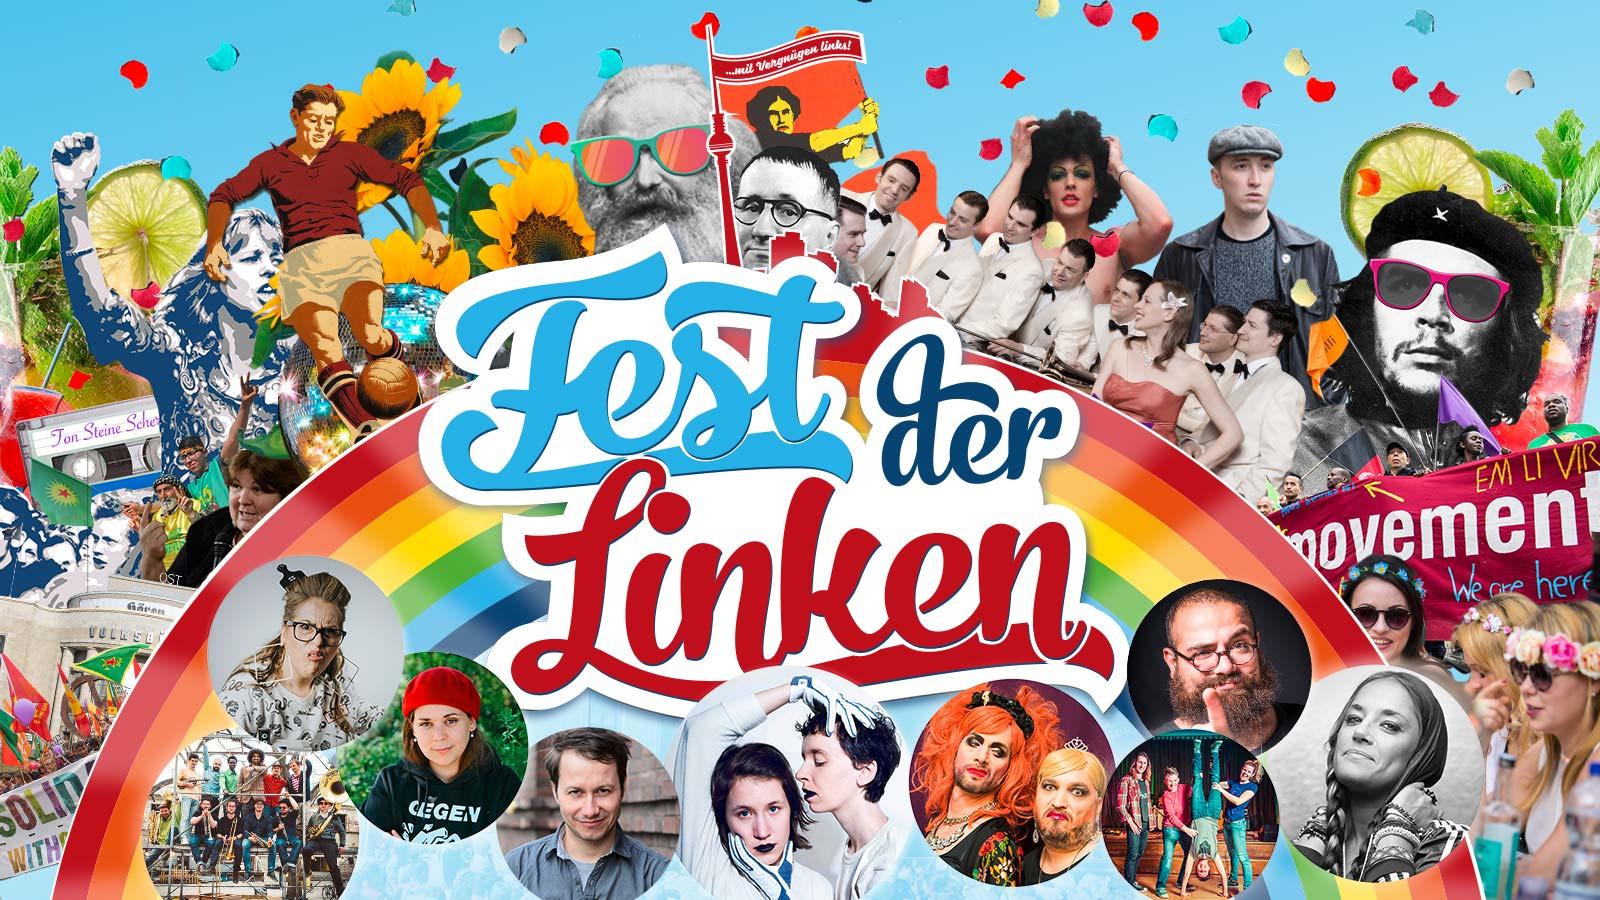 Fest der Linken - Berlin